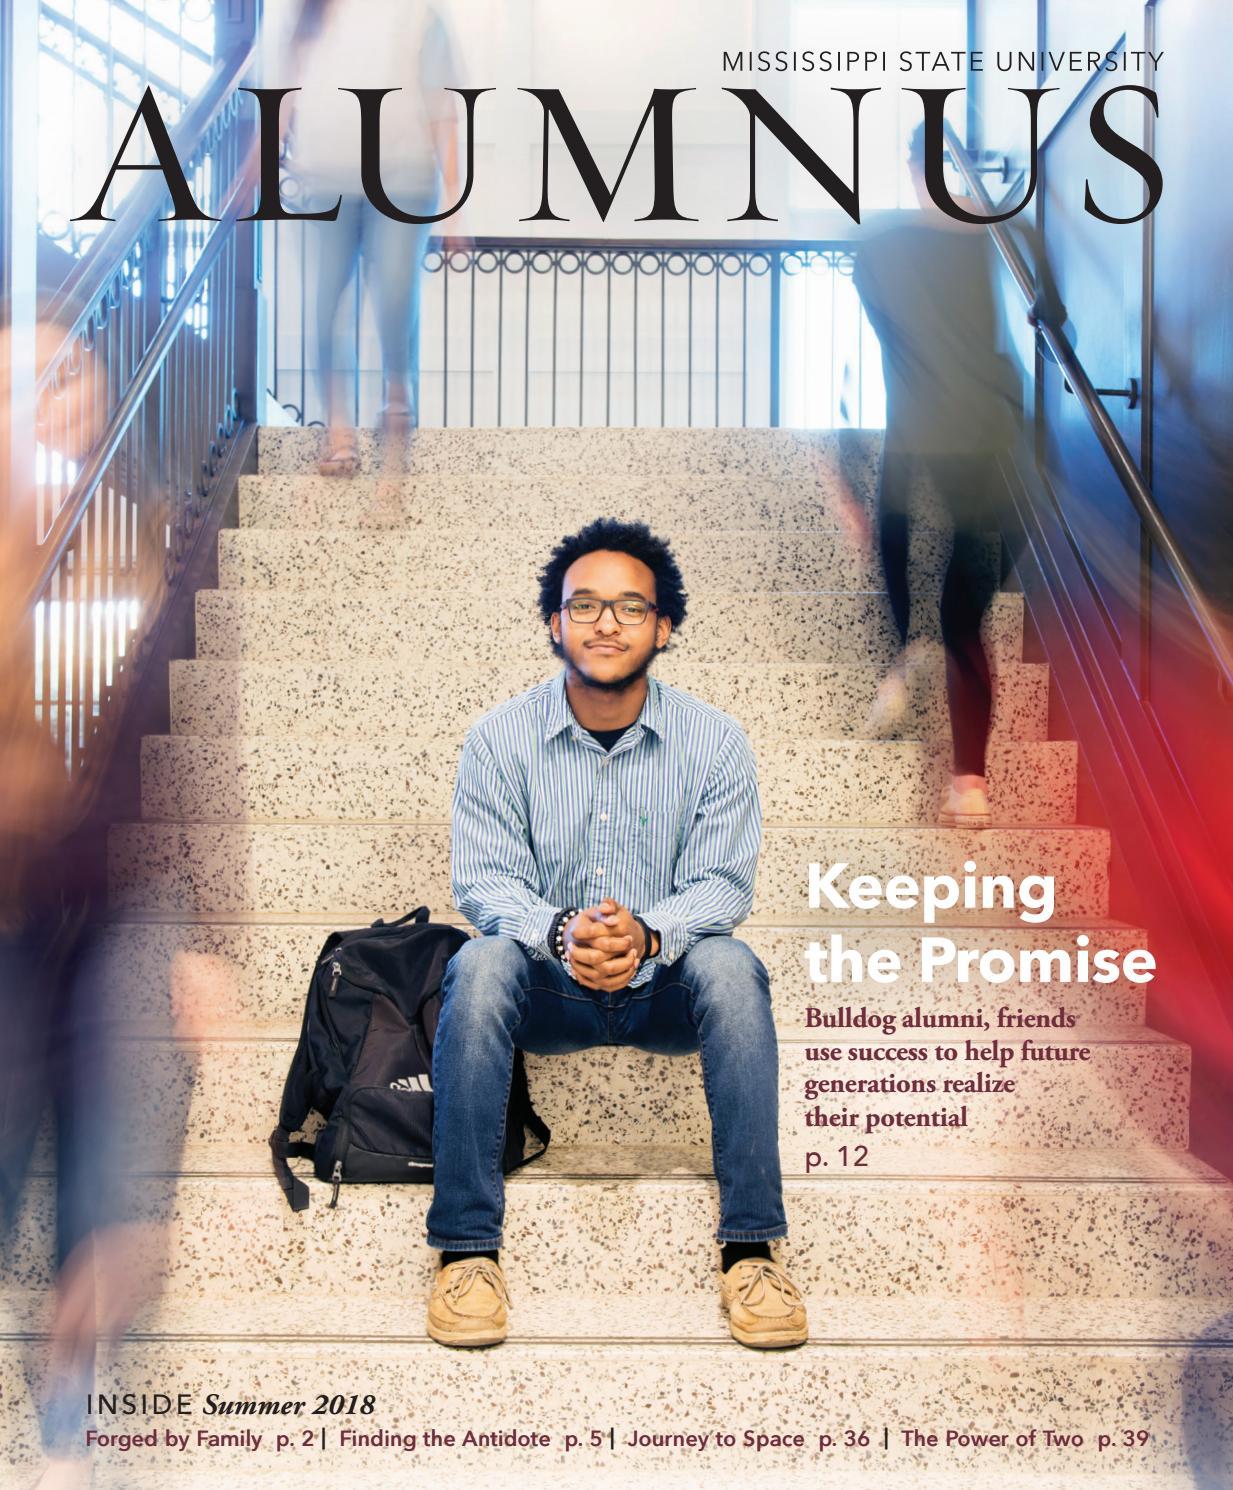 ALUMNUS Summer 2018 - Mississippi State University by